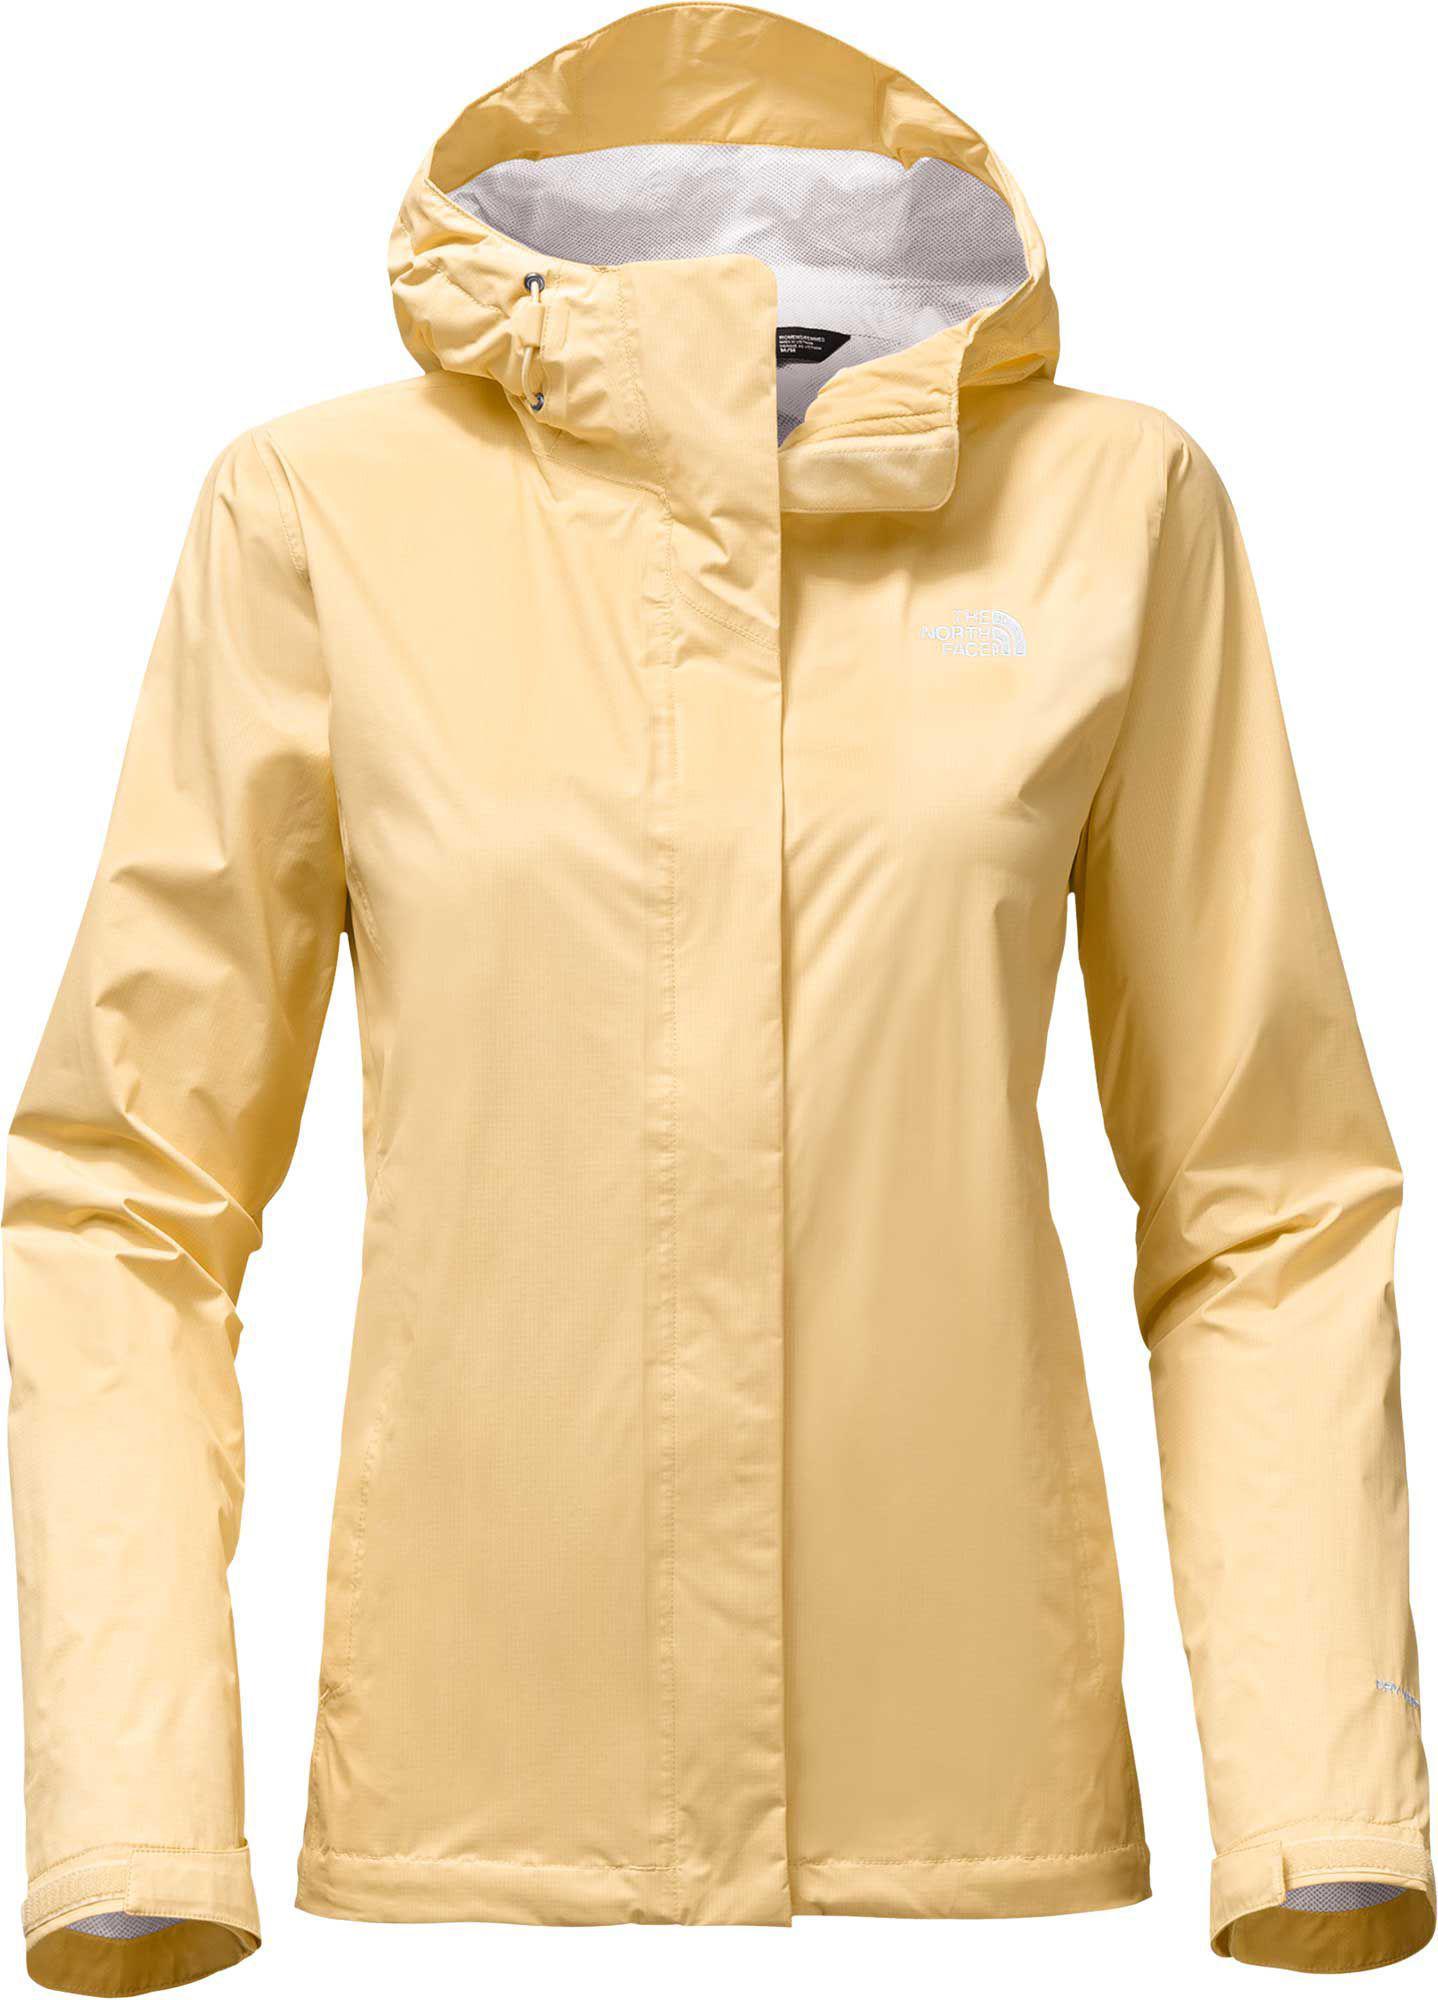 8ab27e0b00 The North Face - Multicolor Venture 2 Jacket - Lyst